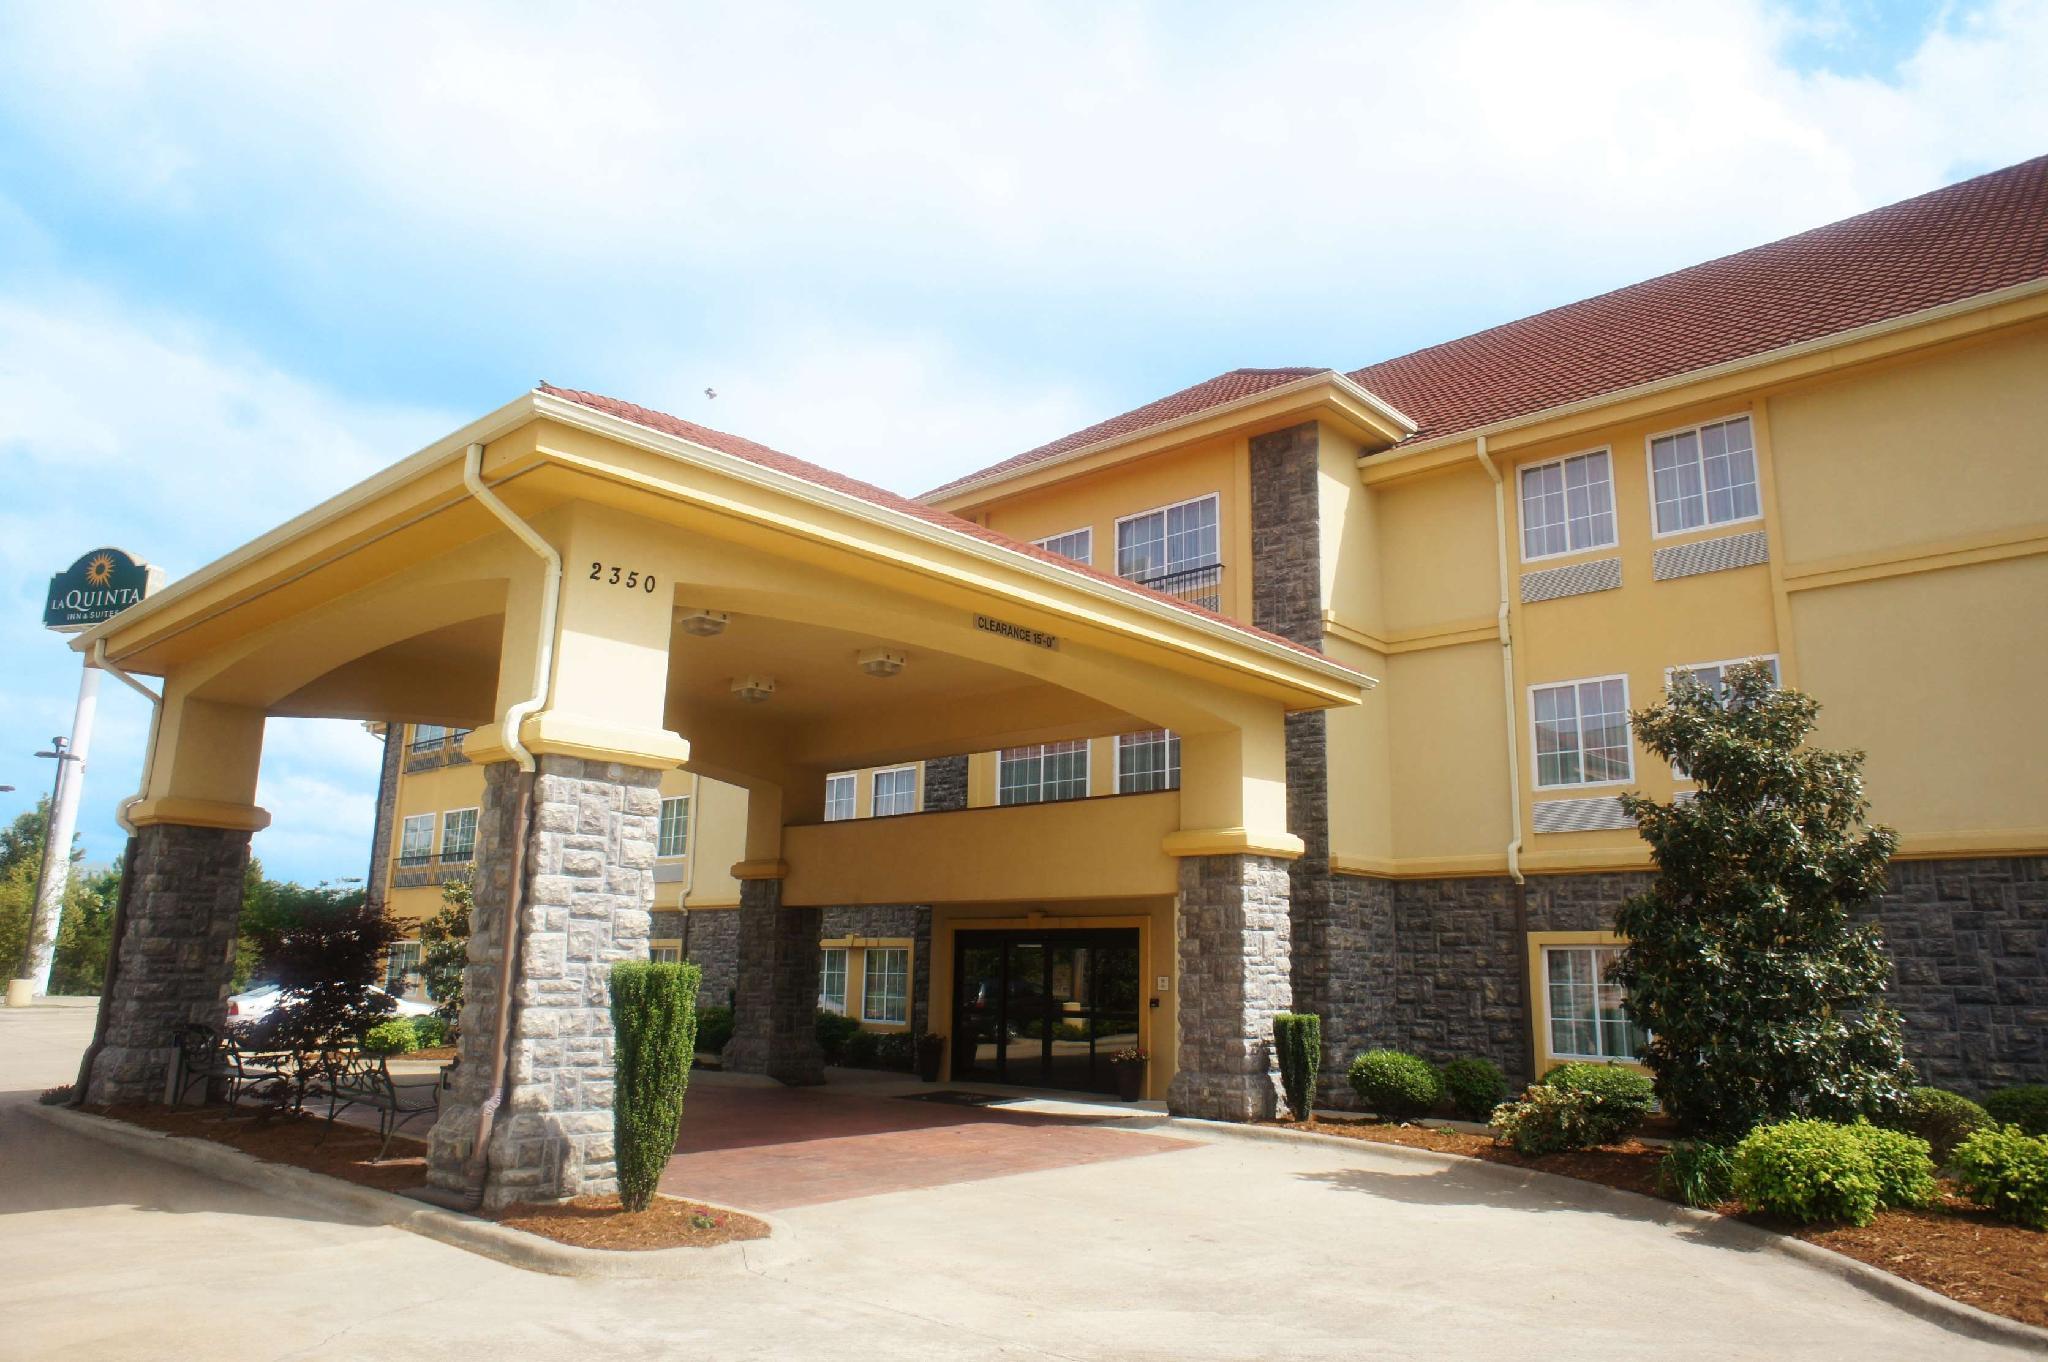 La Quinta Inn And Suites By Wyndham Conway